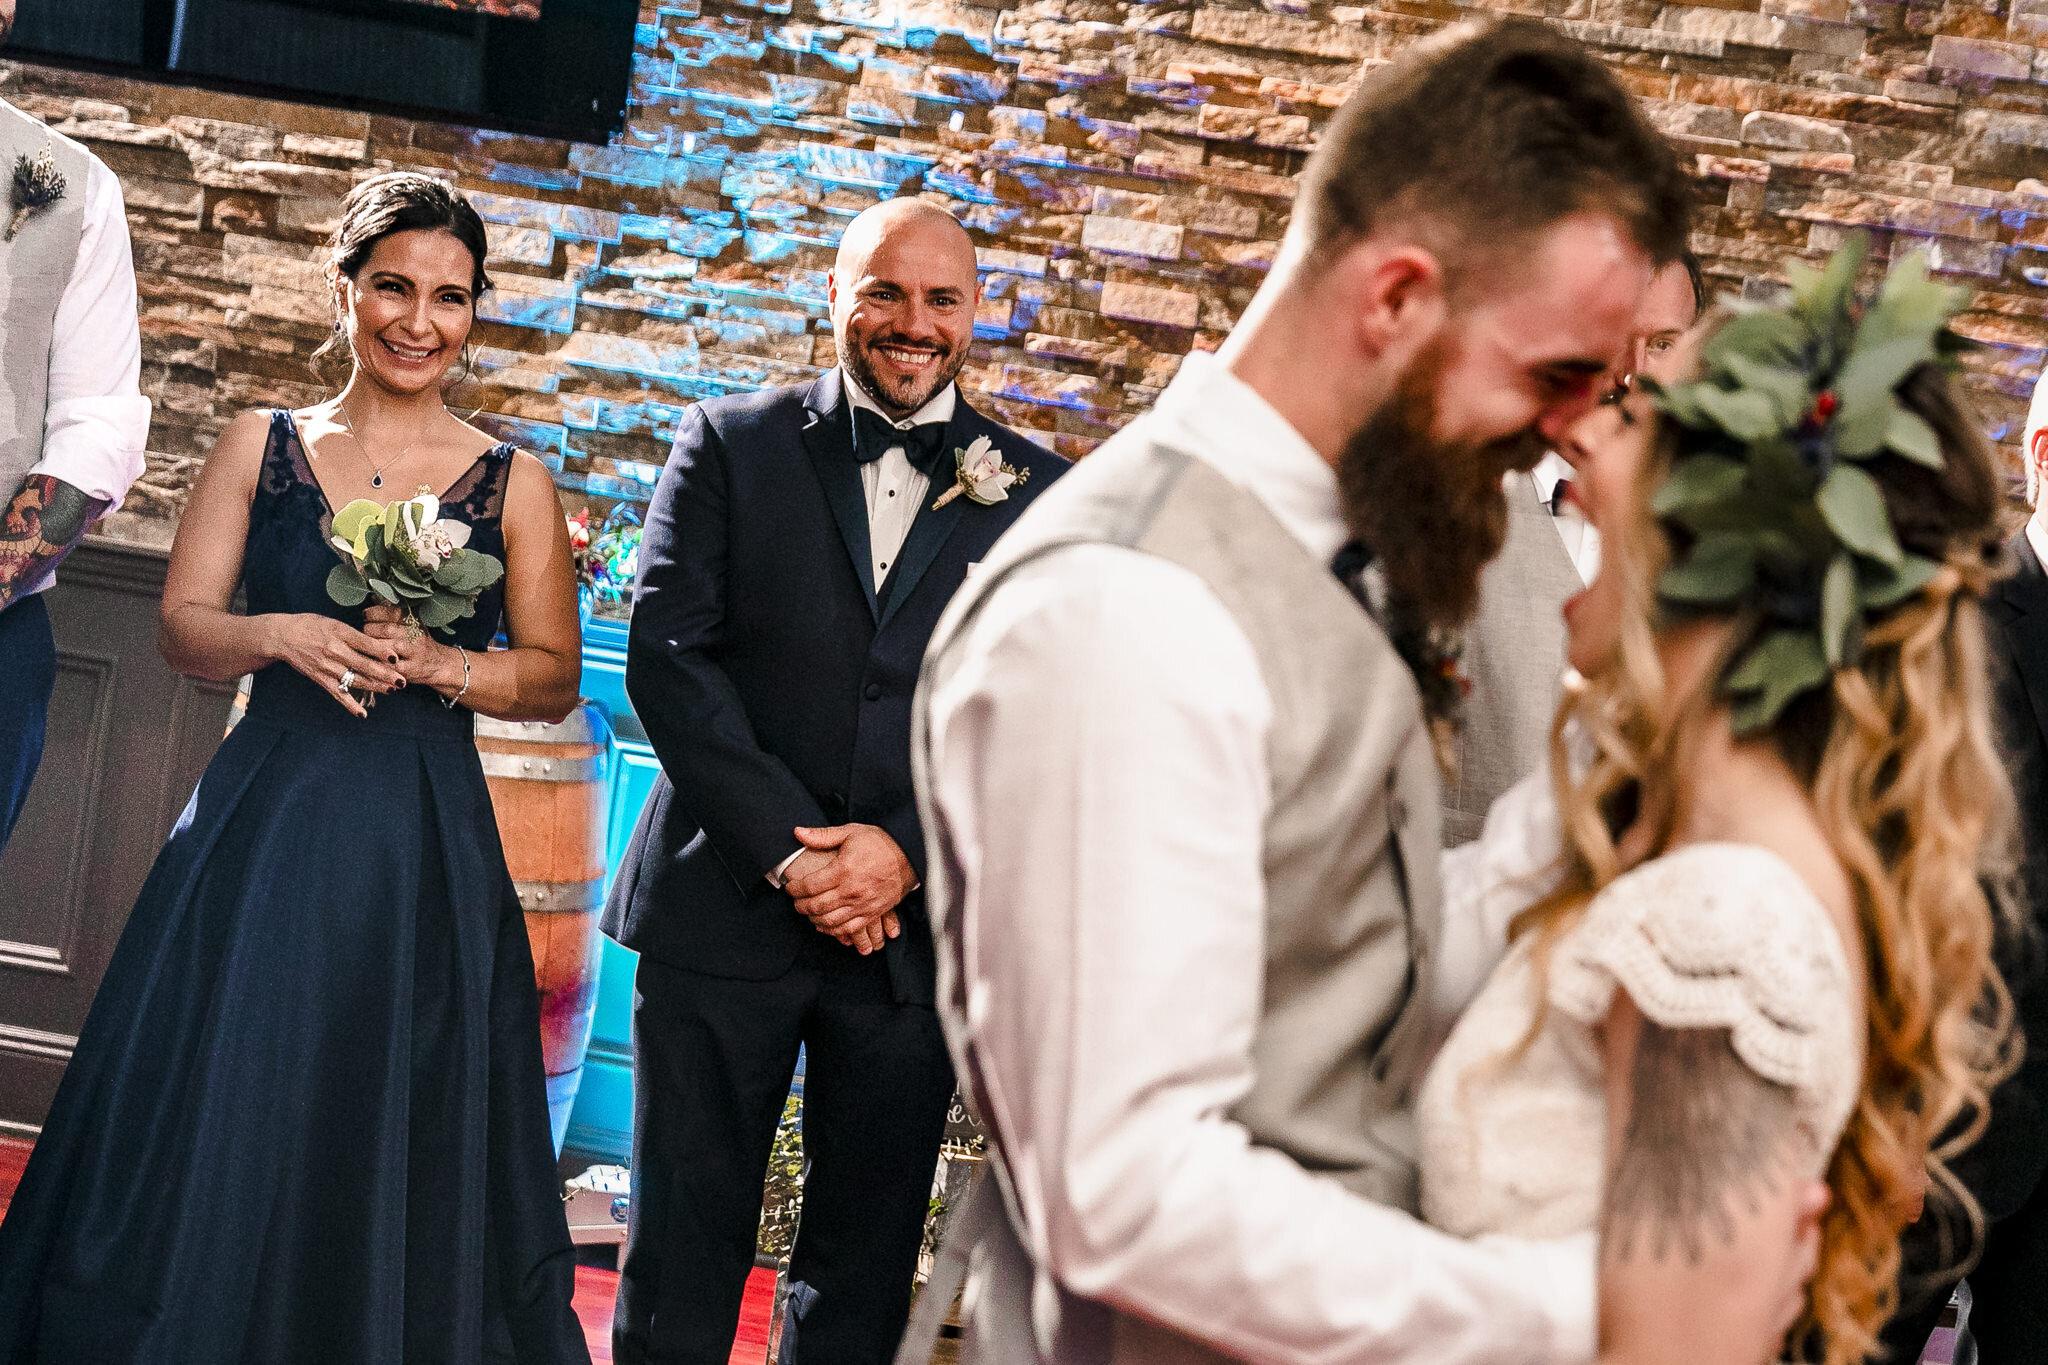 Hoffman-618-New-Jersey-Wedding-Photographer-34.JPG